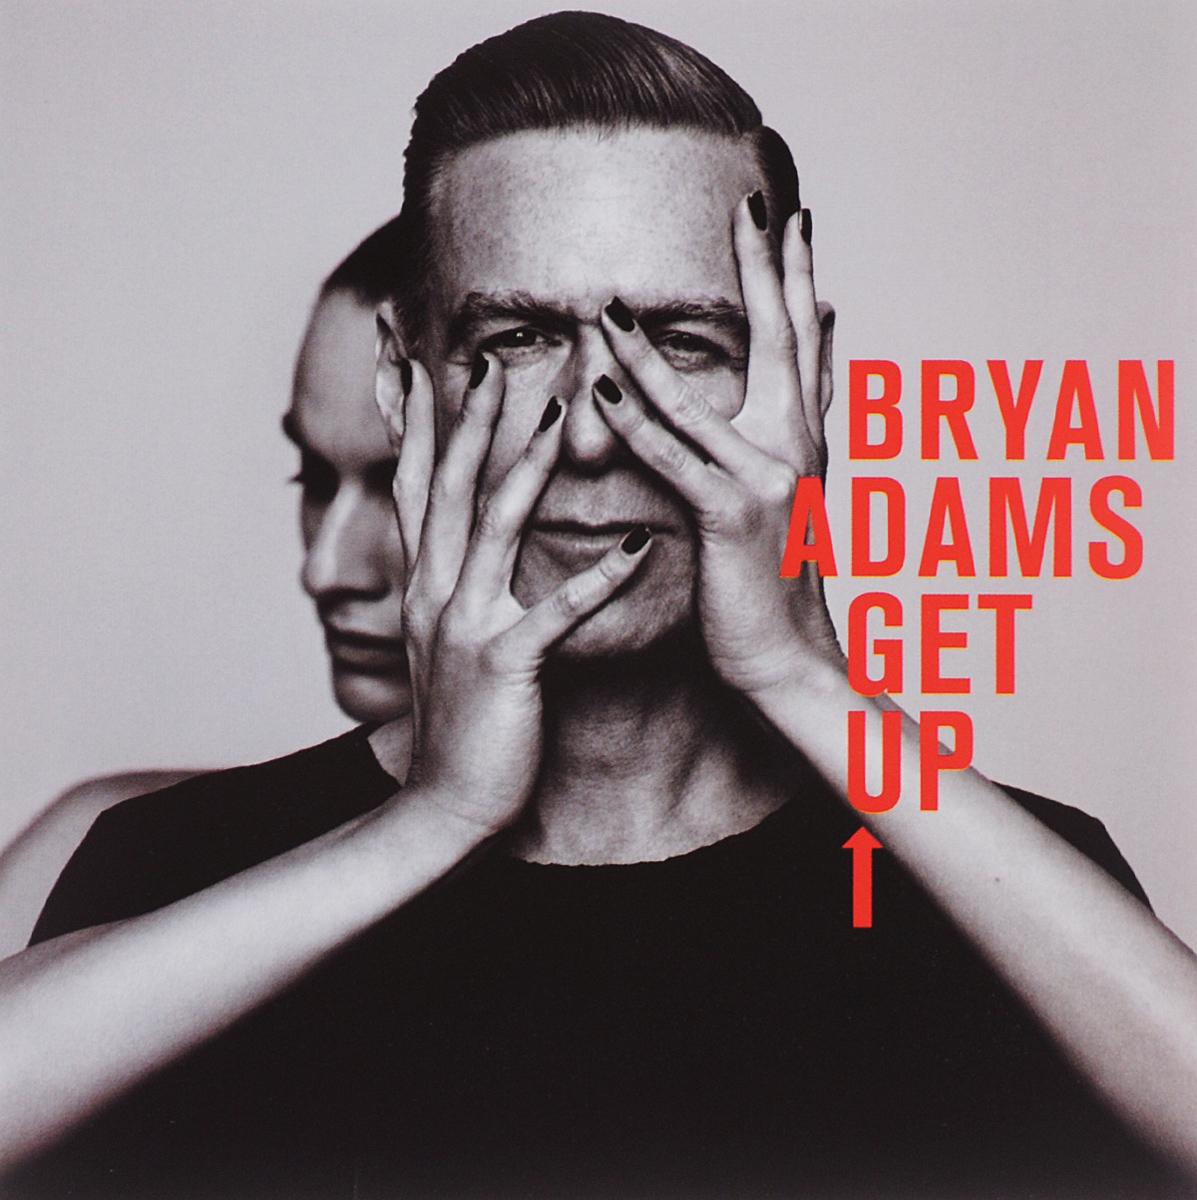 Bryan Adams. Get Up